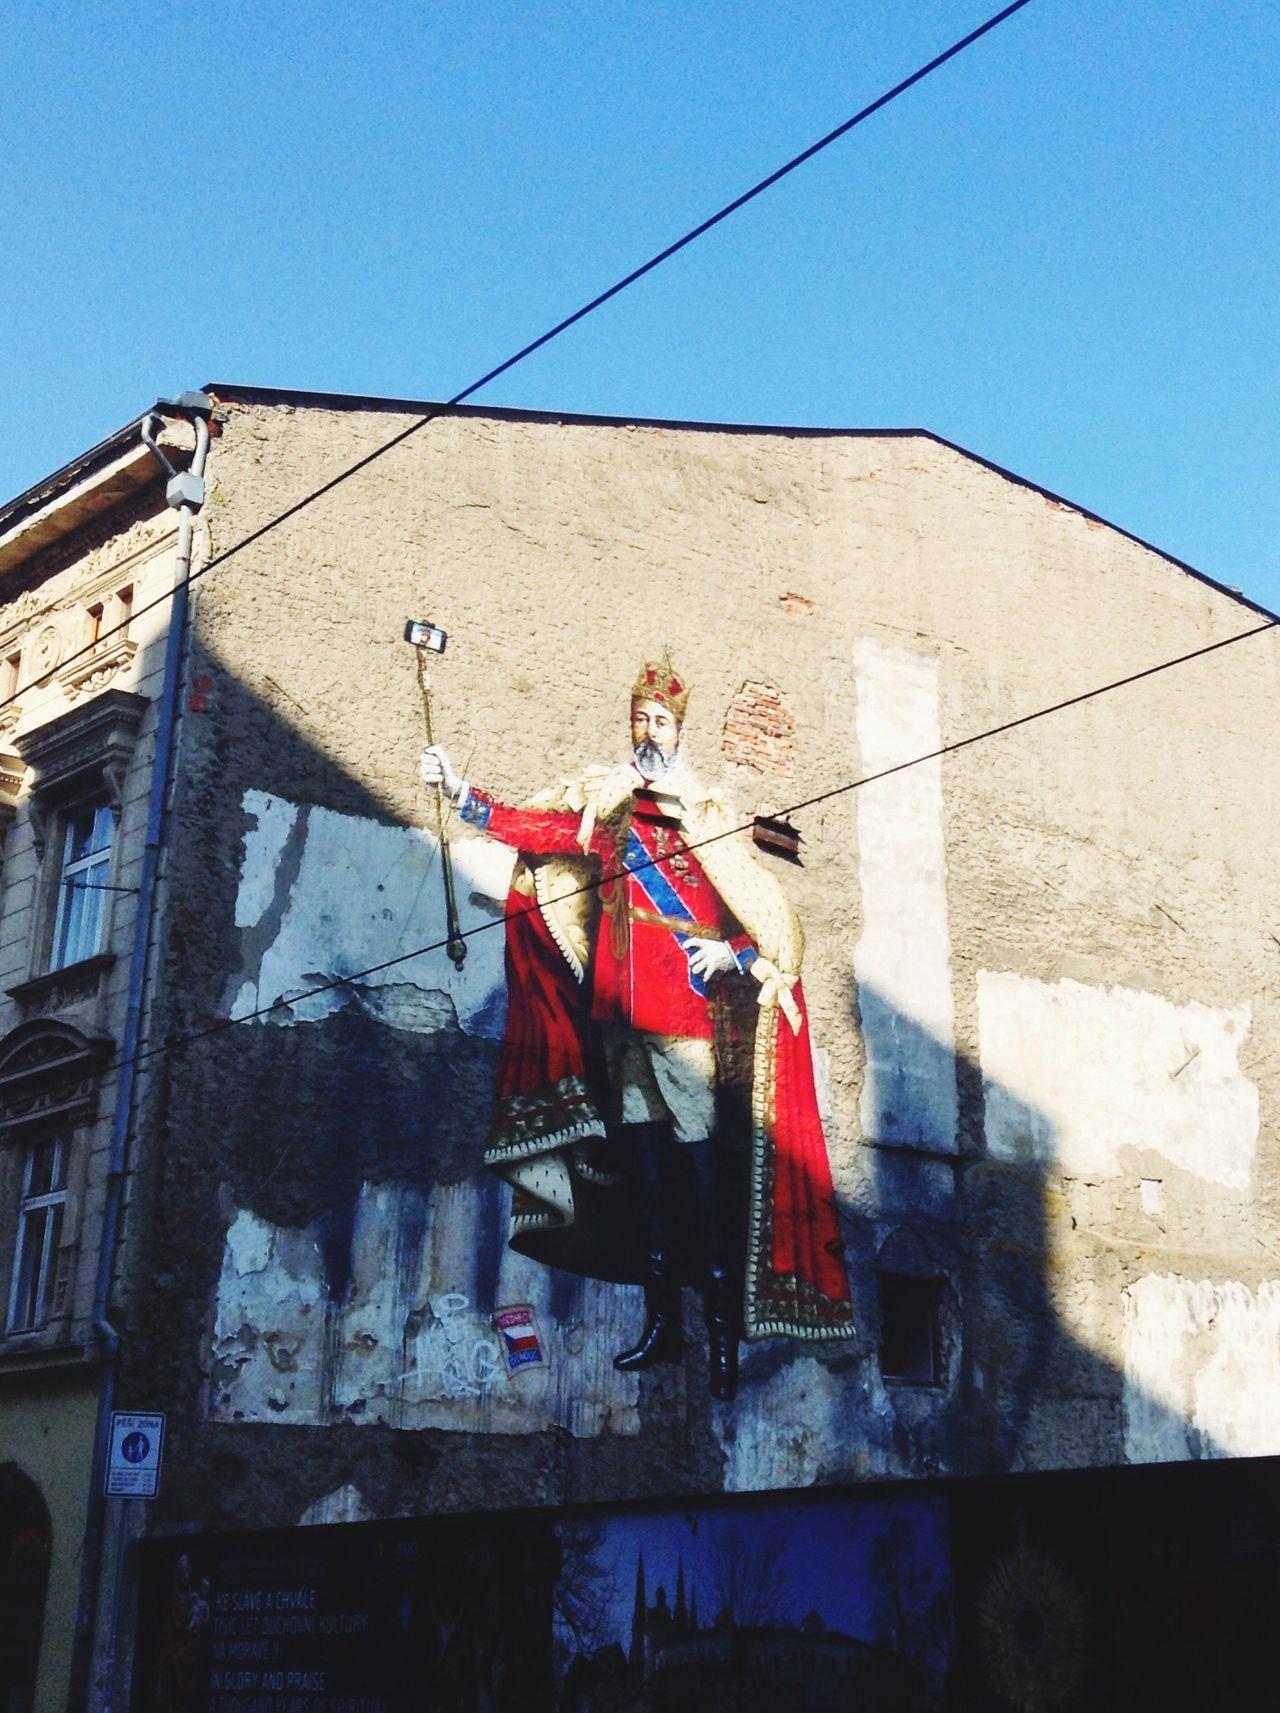 нашидни креатив селфипалка Актуальновнашидни Czech Republic Outdoors Street Photography Street Art Graffiti Actually